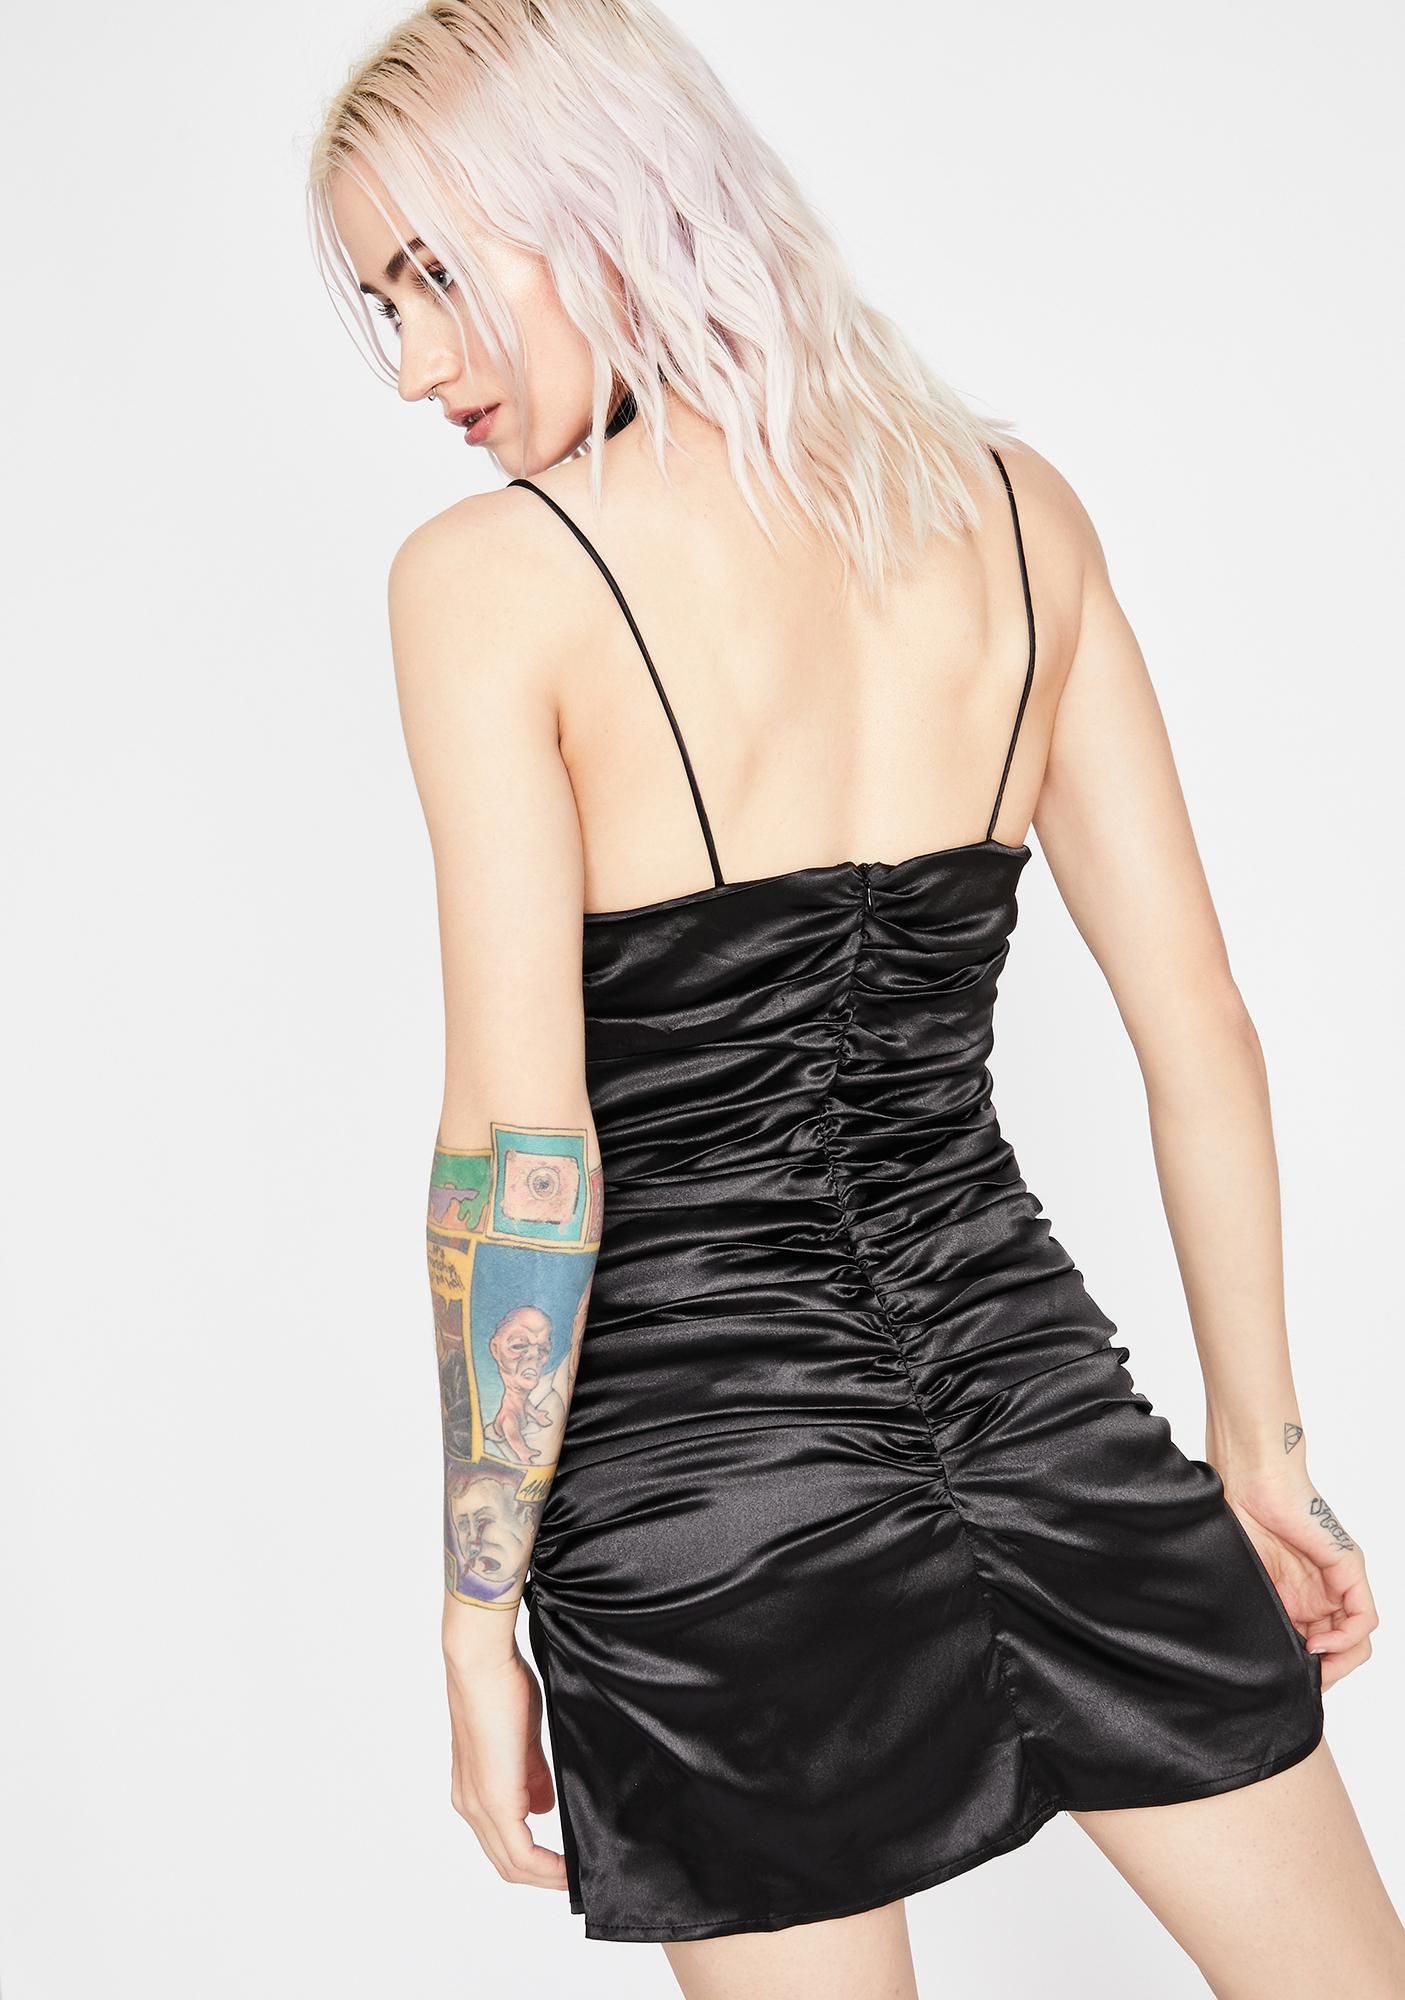 Midnight Lover's Embrace Satin Dress